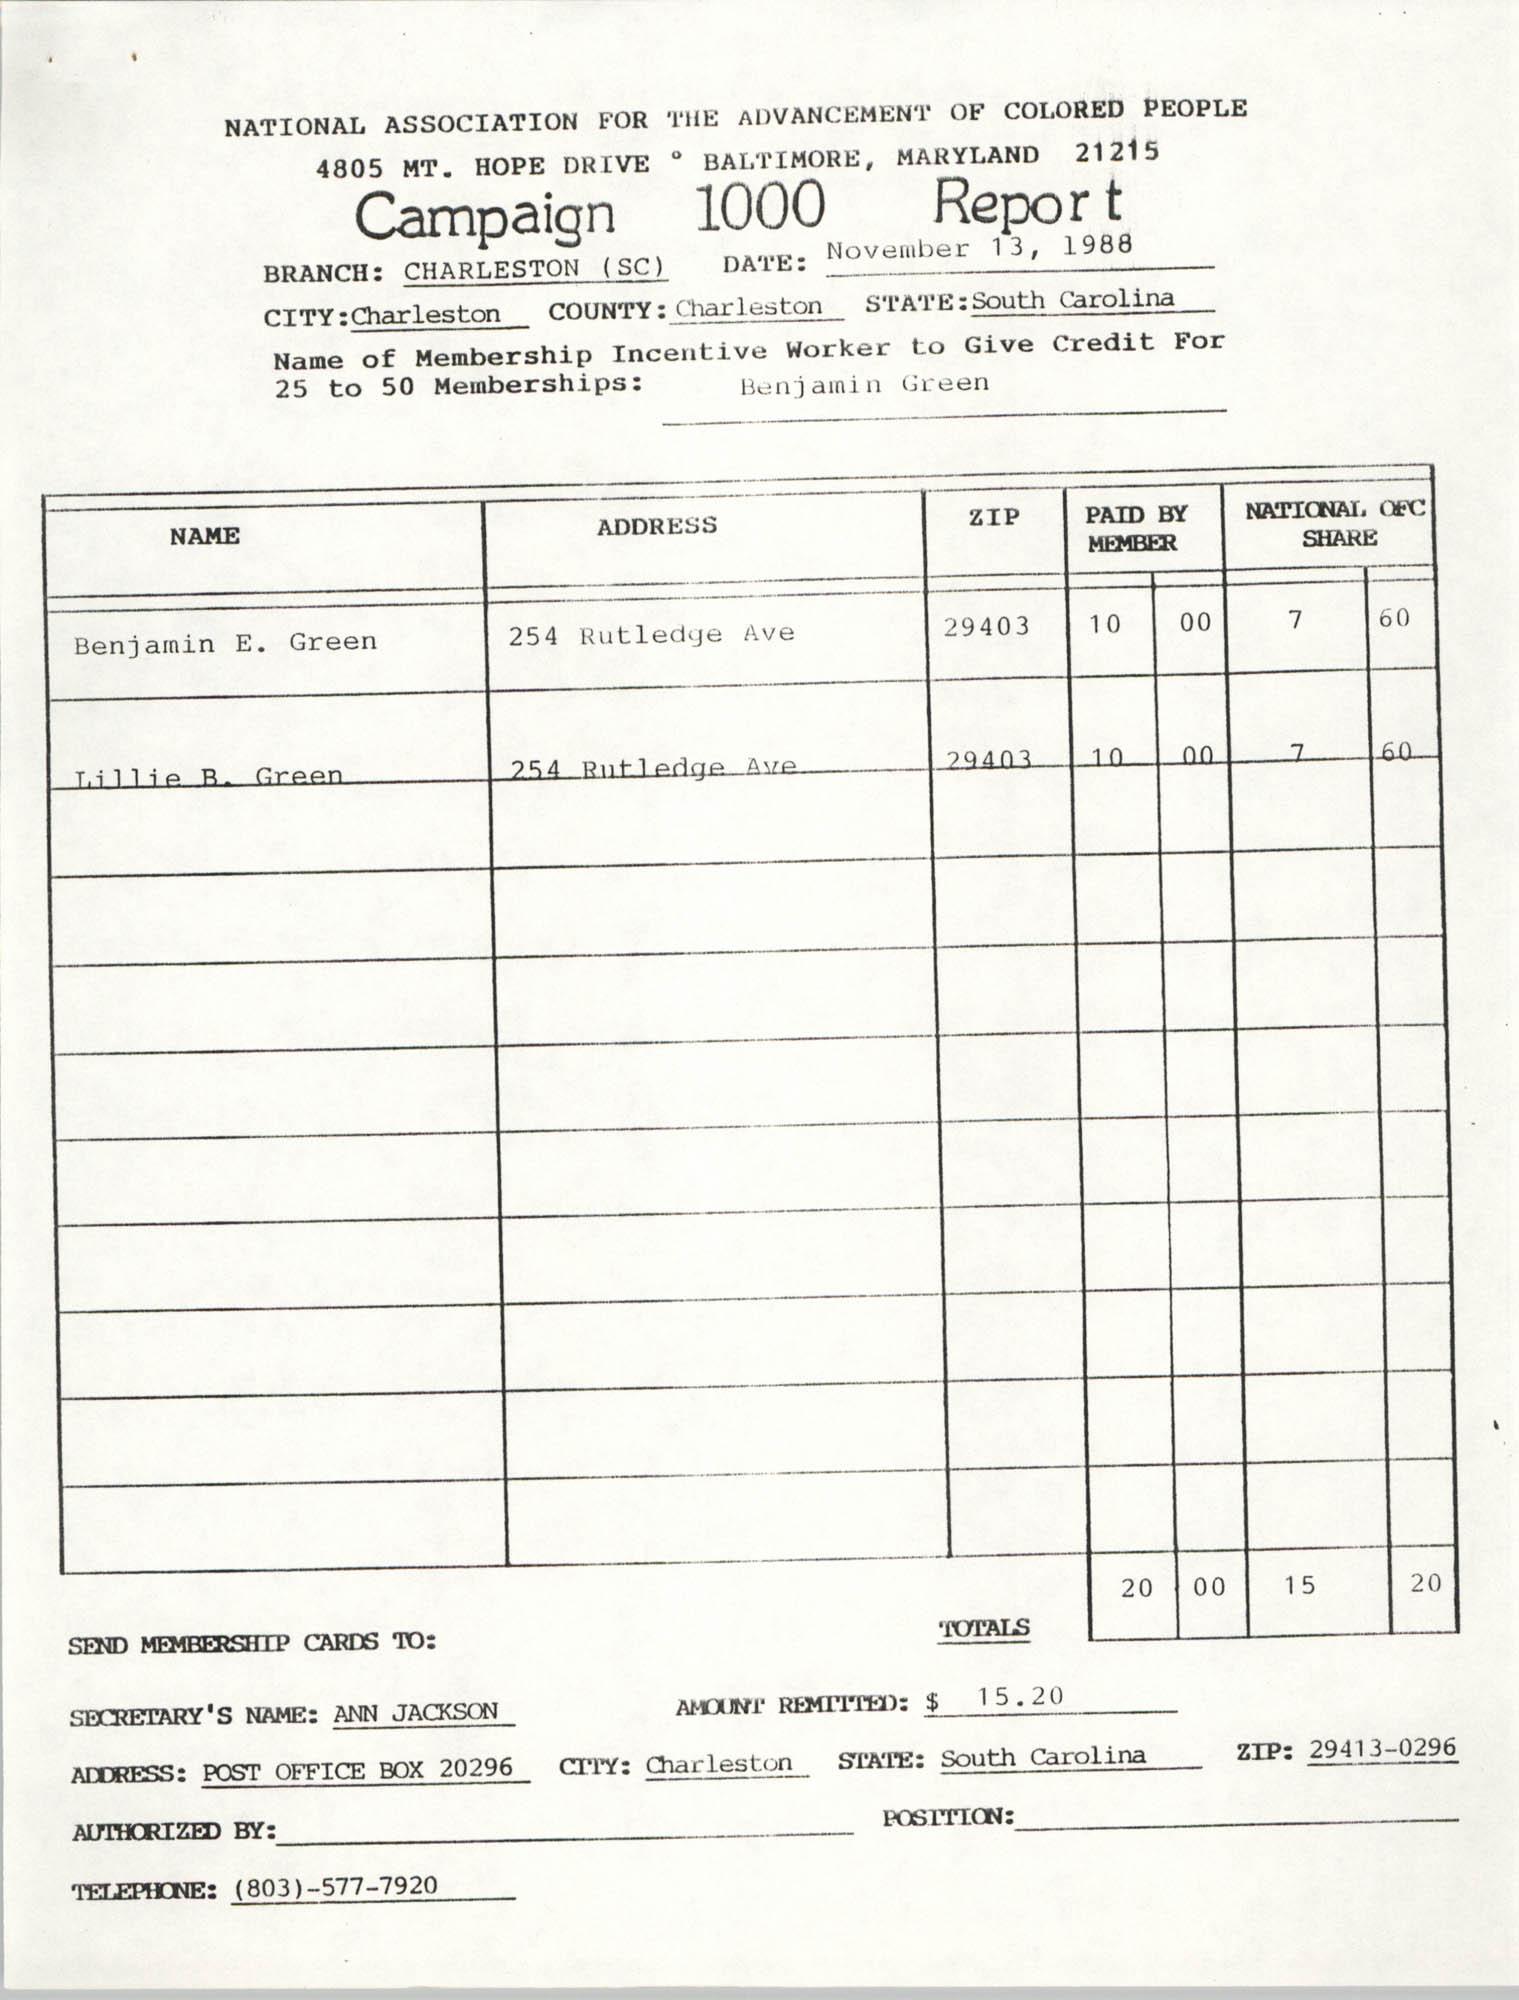 Campaign 1000 Report, Benjamin Green, Charleston Branch of the NAACP, November 13, 1988